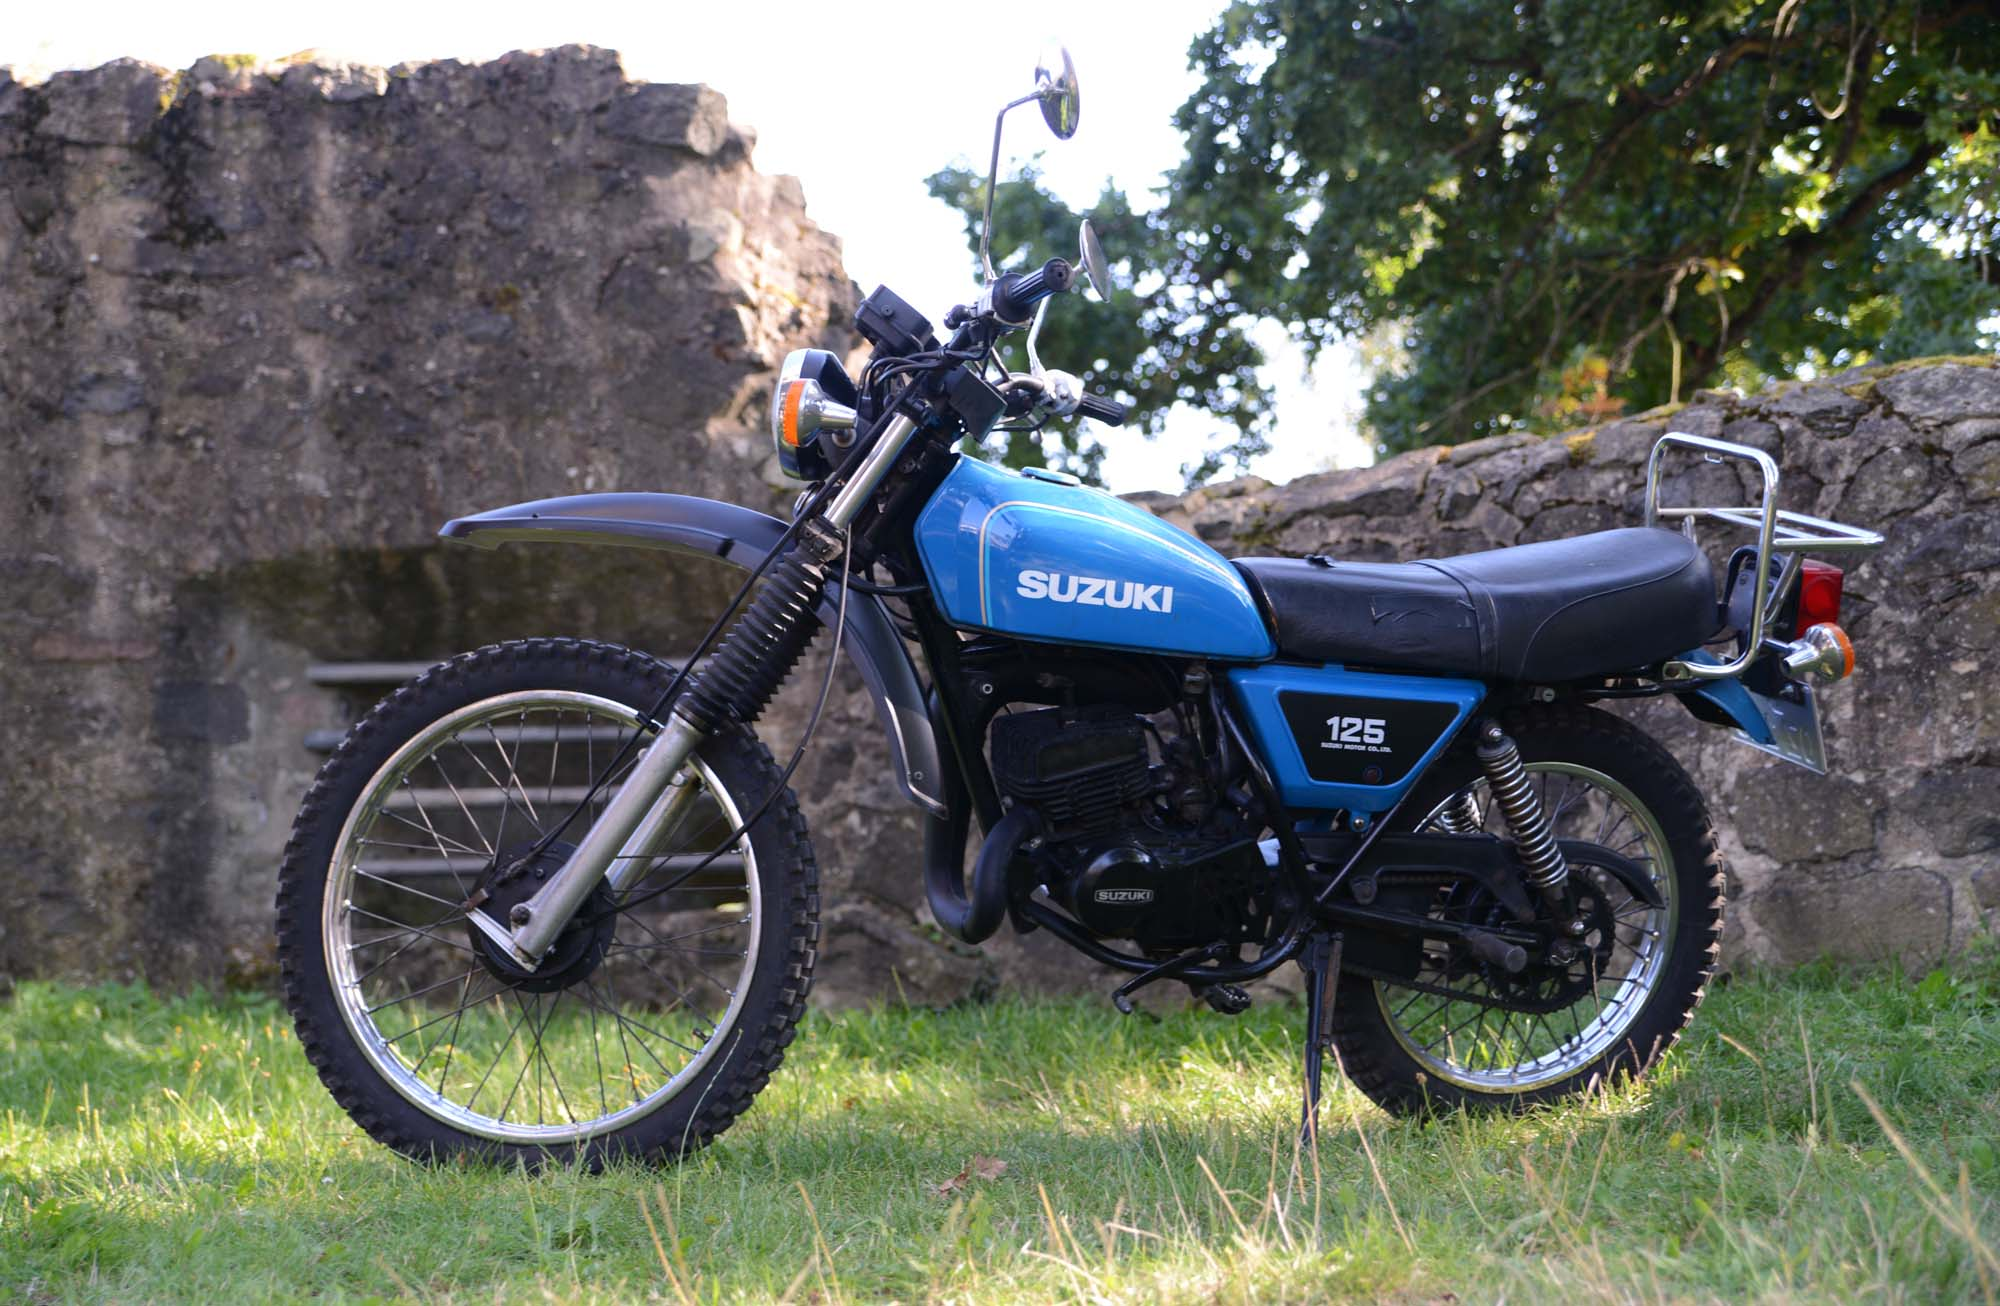 SUZUKI TS 125 (1971 - 1982)